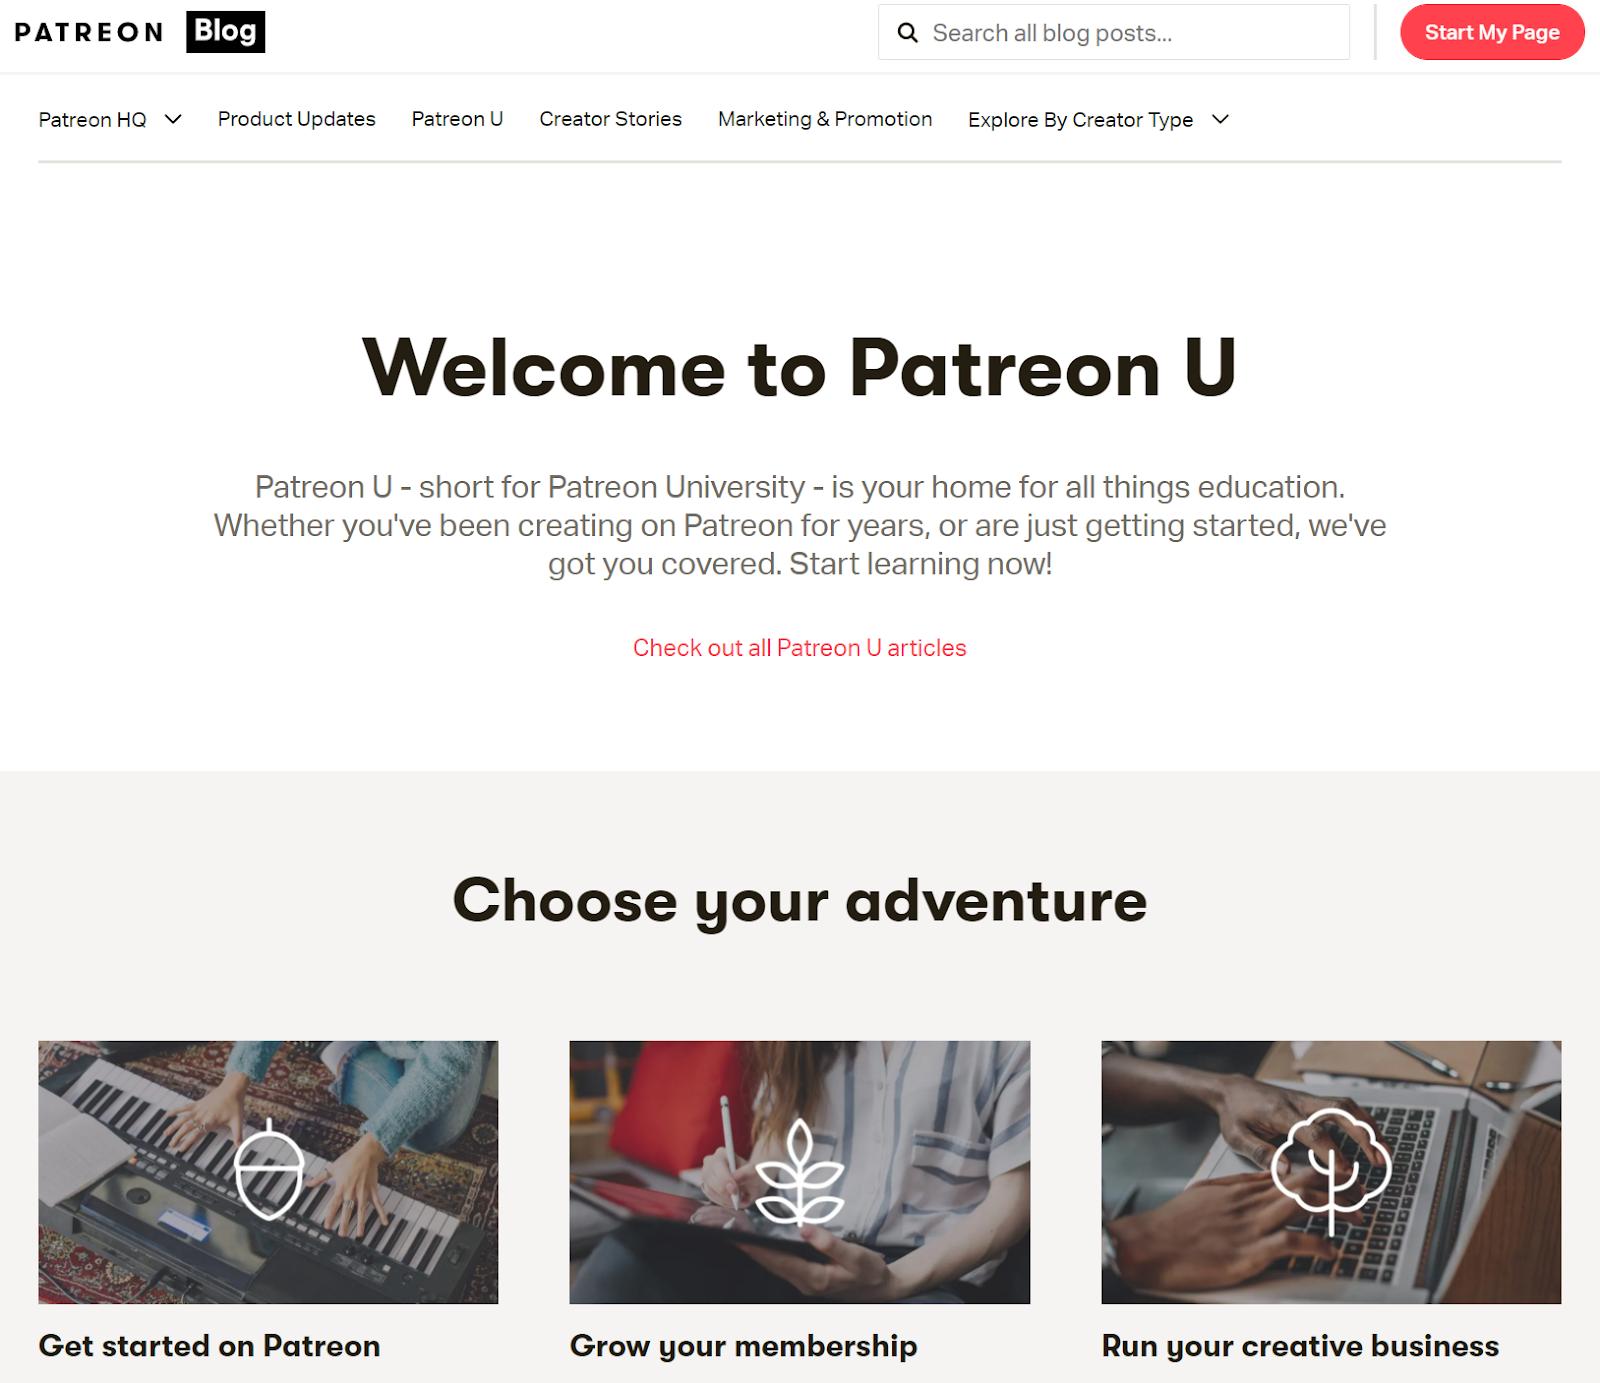 Screenshot of Patreon U with content topics